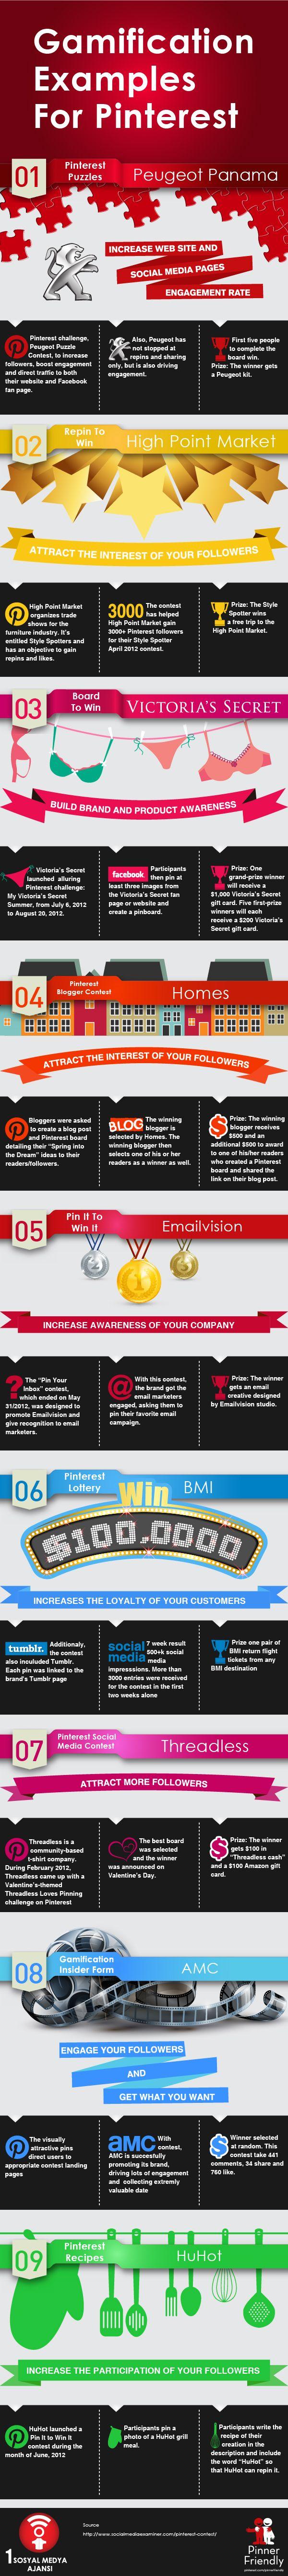 Ejemplos de gamificación en Pinterest. #Infografía en inglés. Nombre original: Gamification Examples for Pinterest